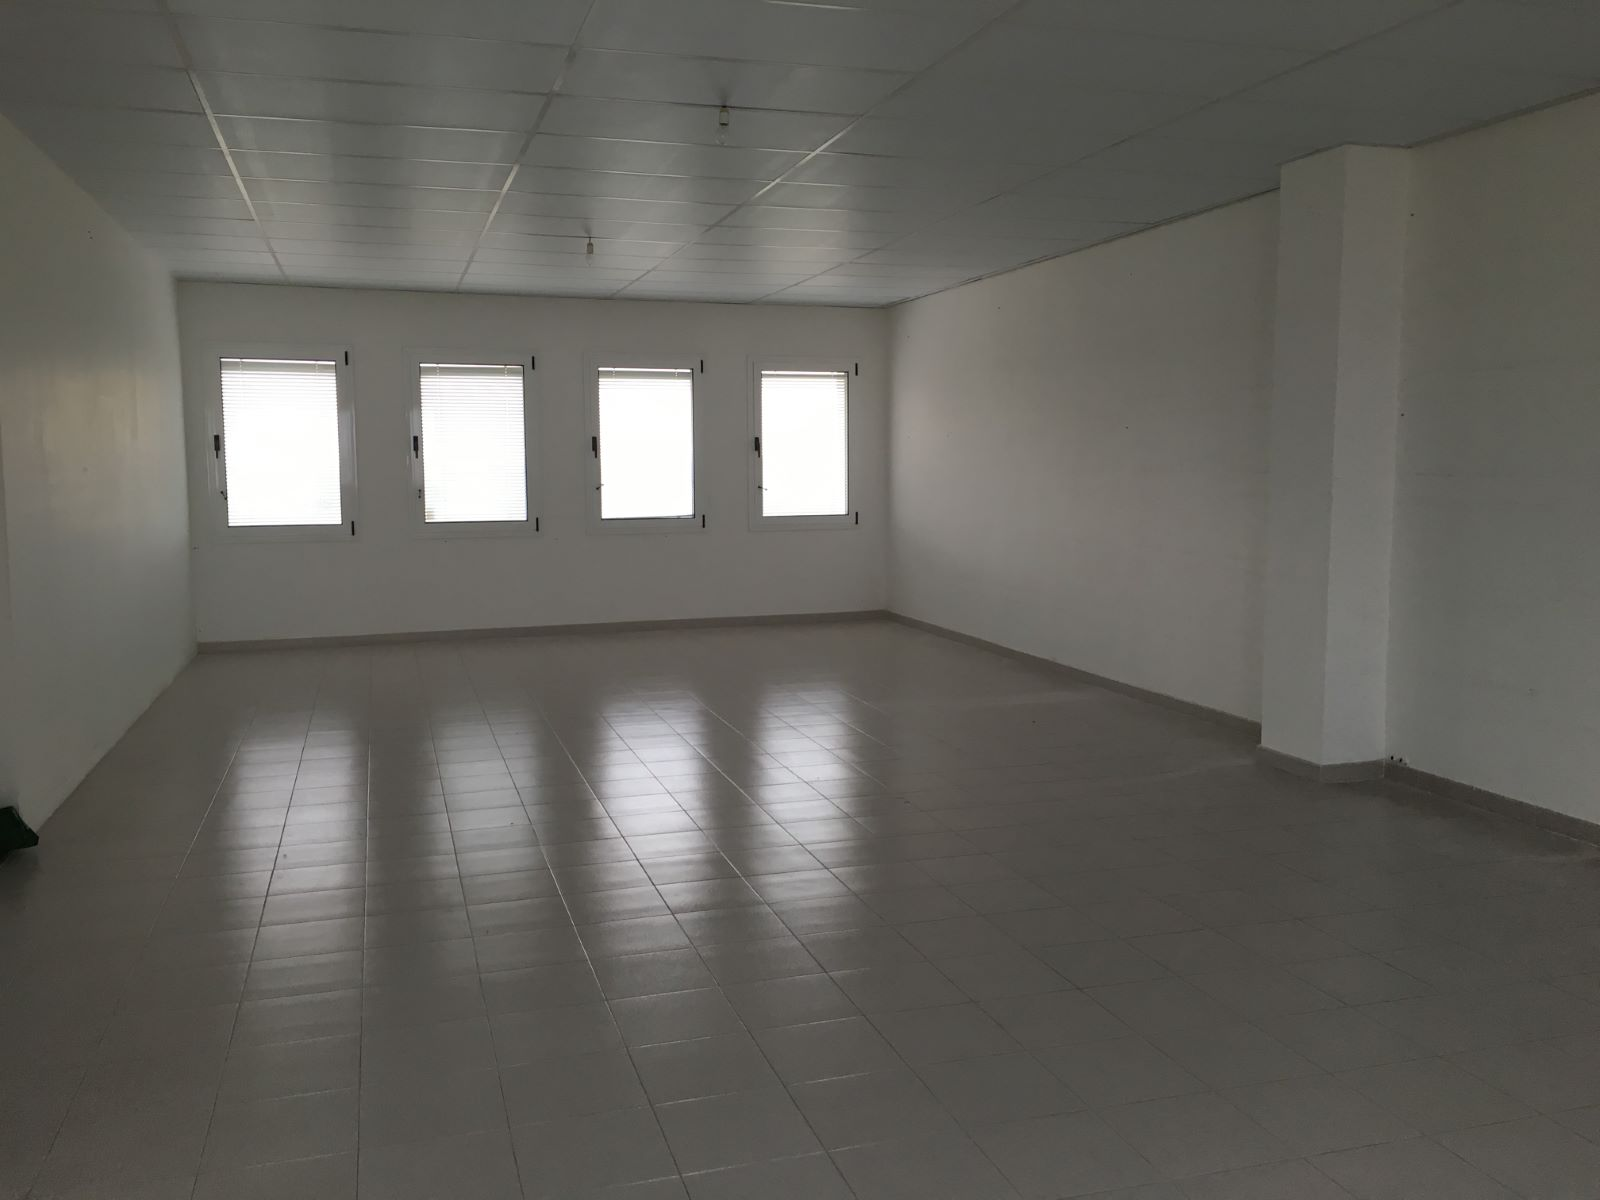 Local comercial en Zona Poligono (Poima) Ref: M7849 5